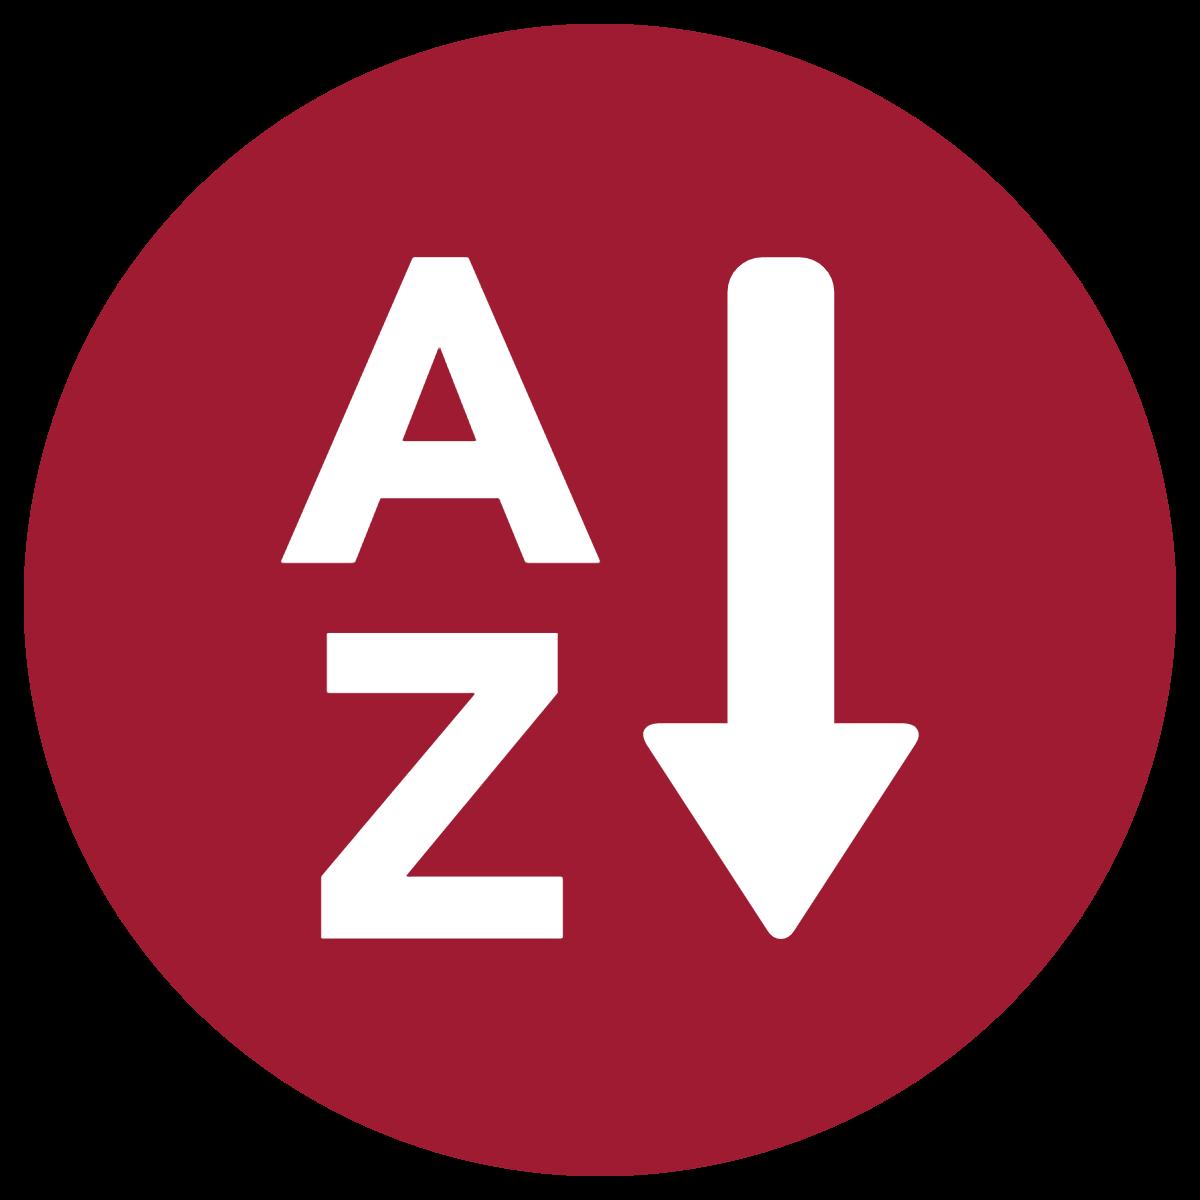 alphbetical listing